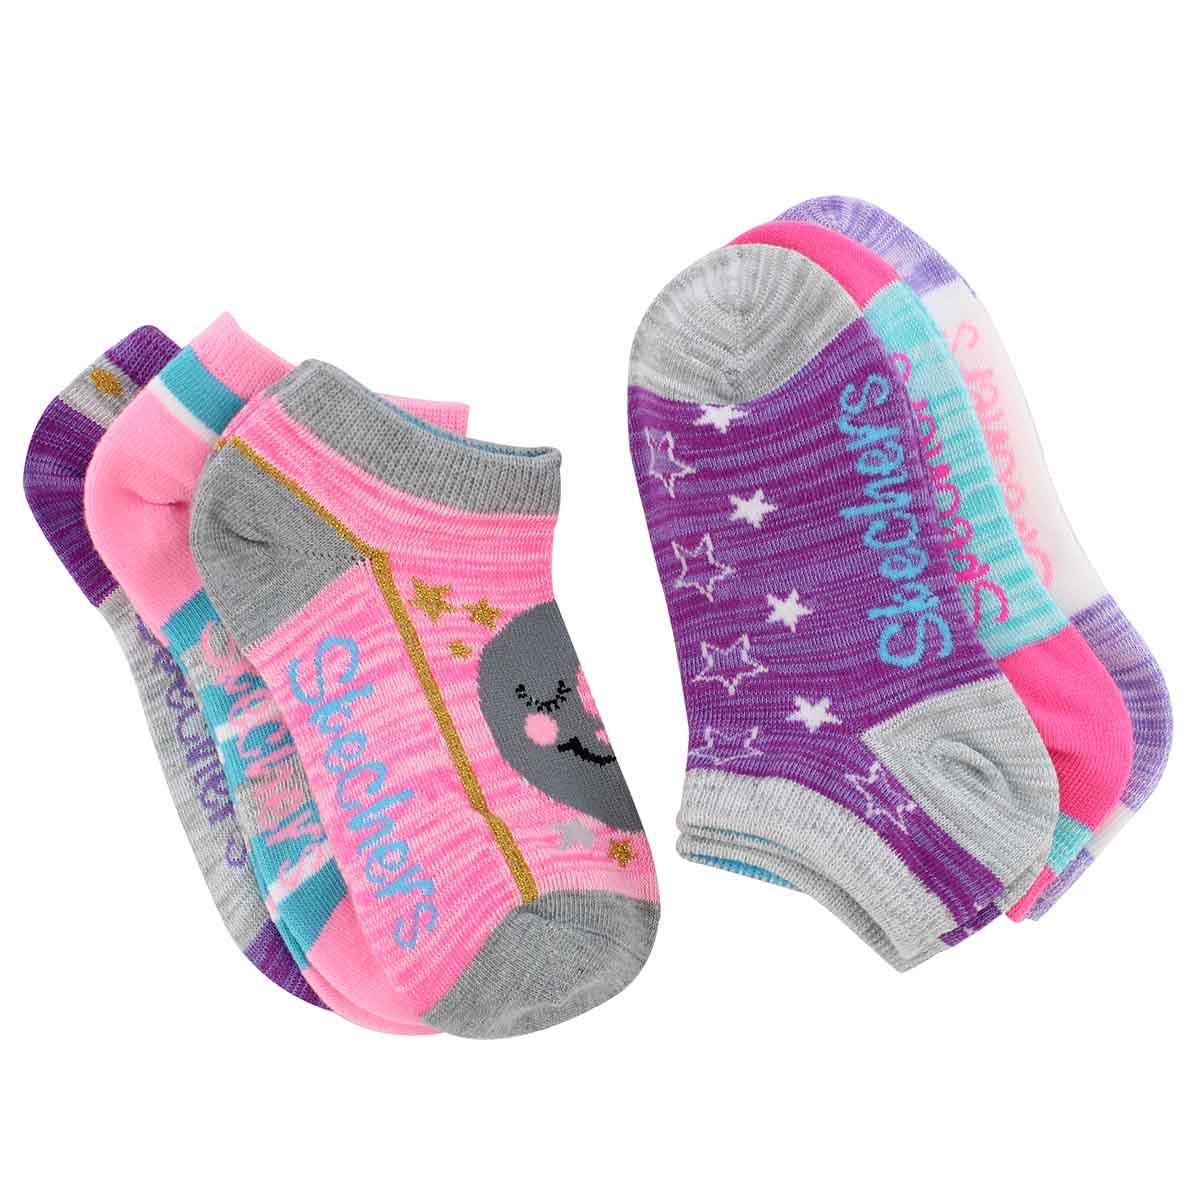 Grls Non Terry ppl/pnk mlti low sock 6pk